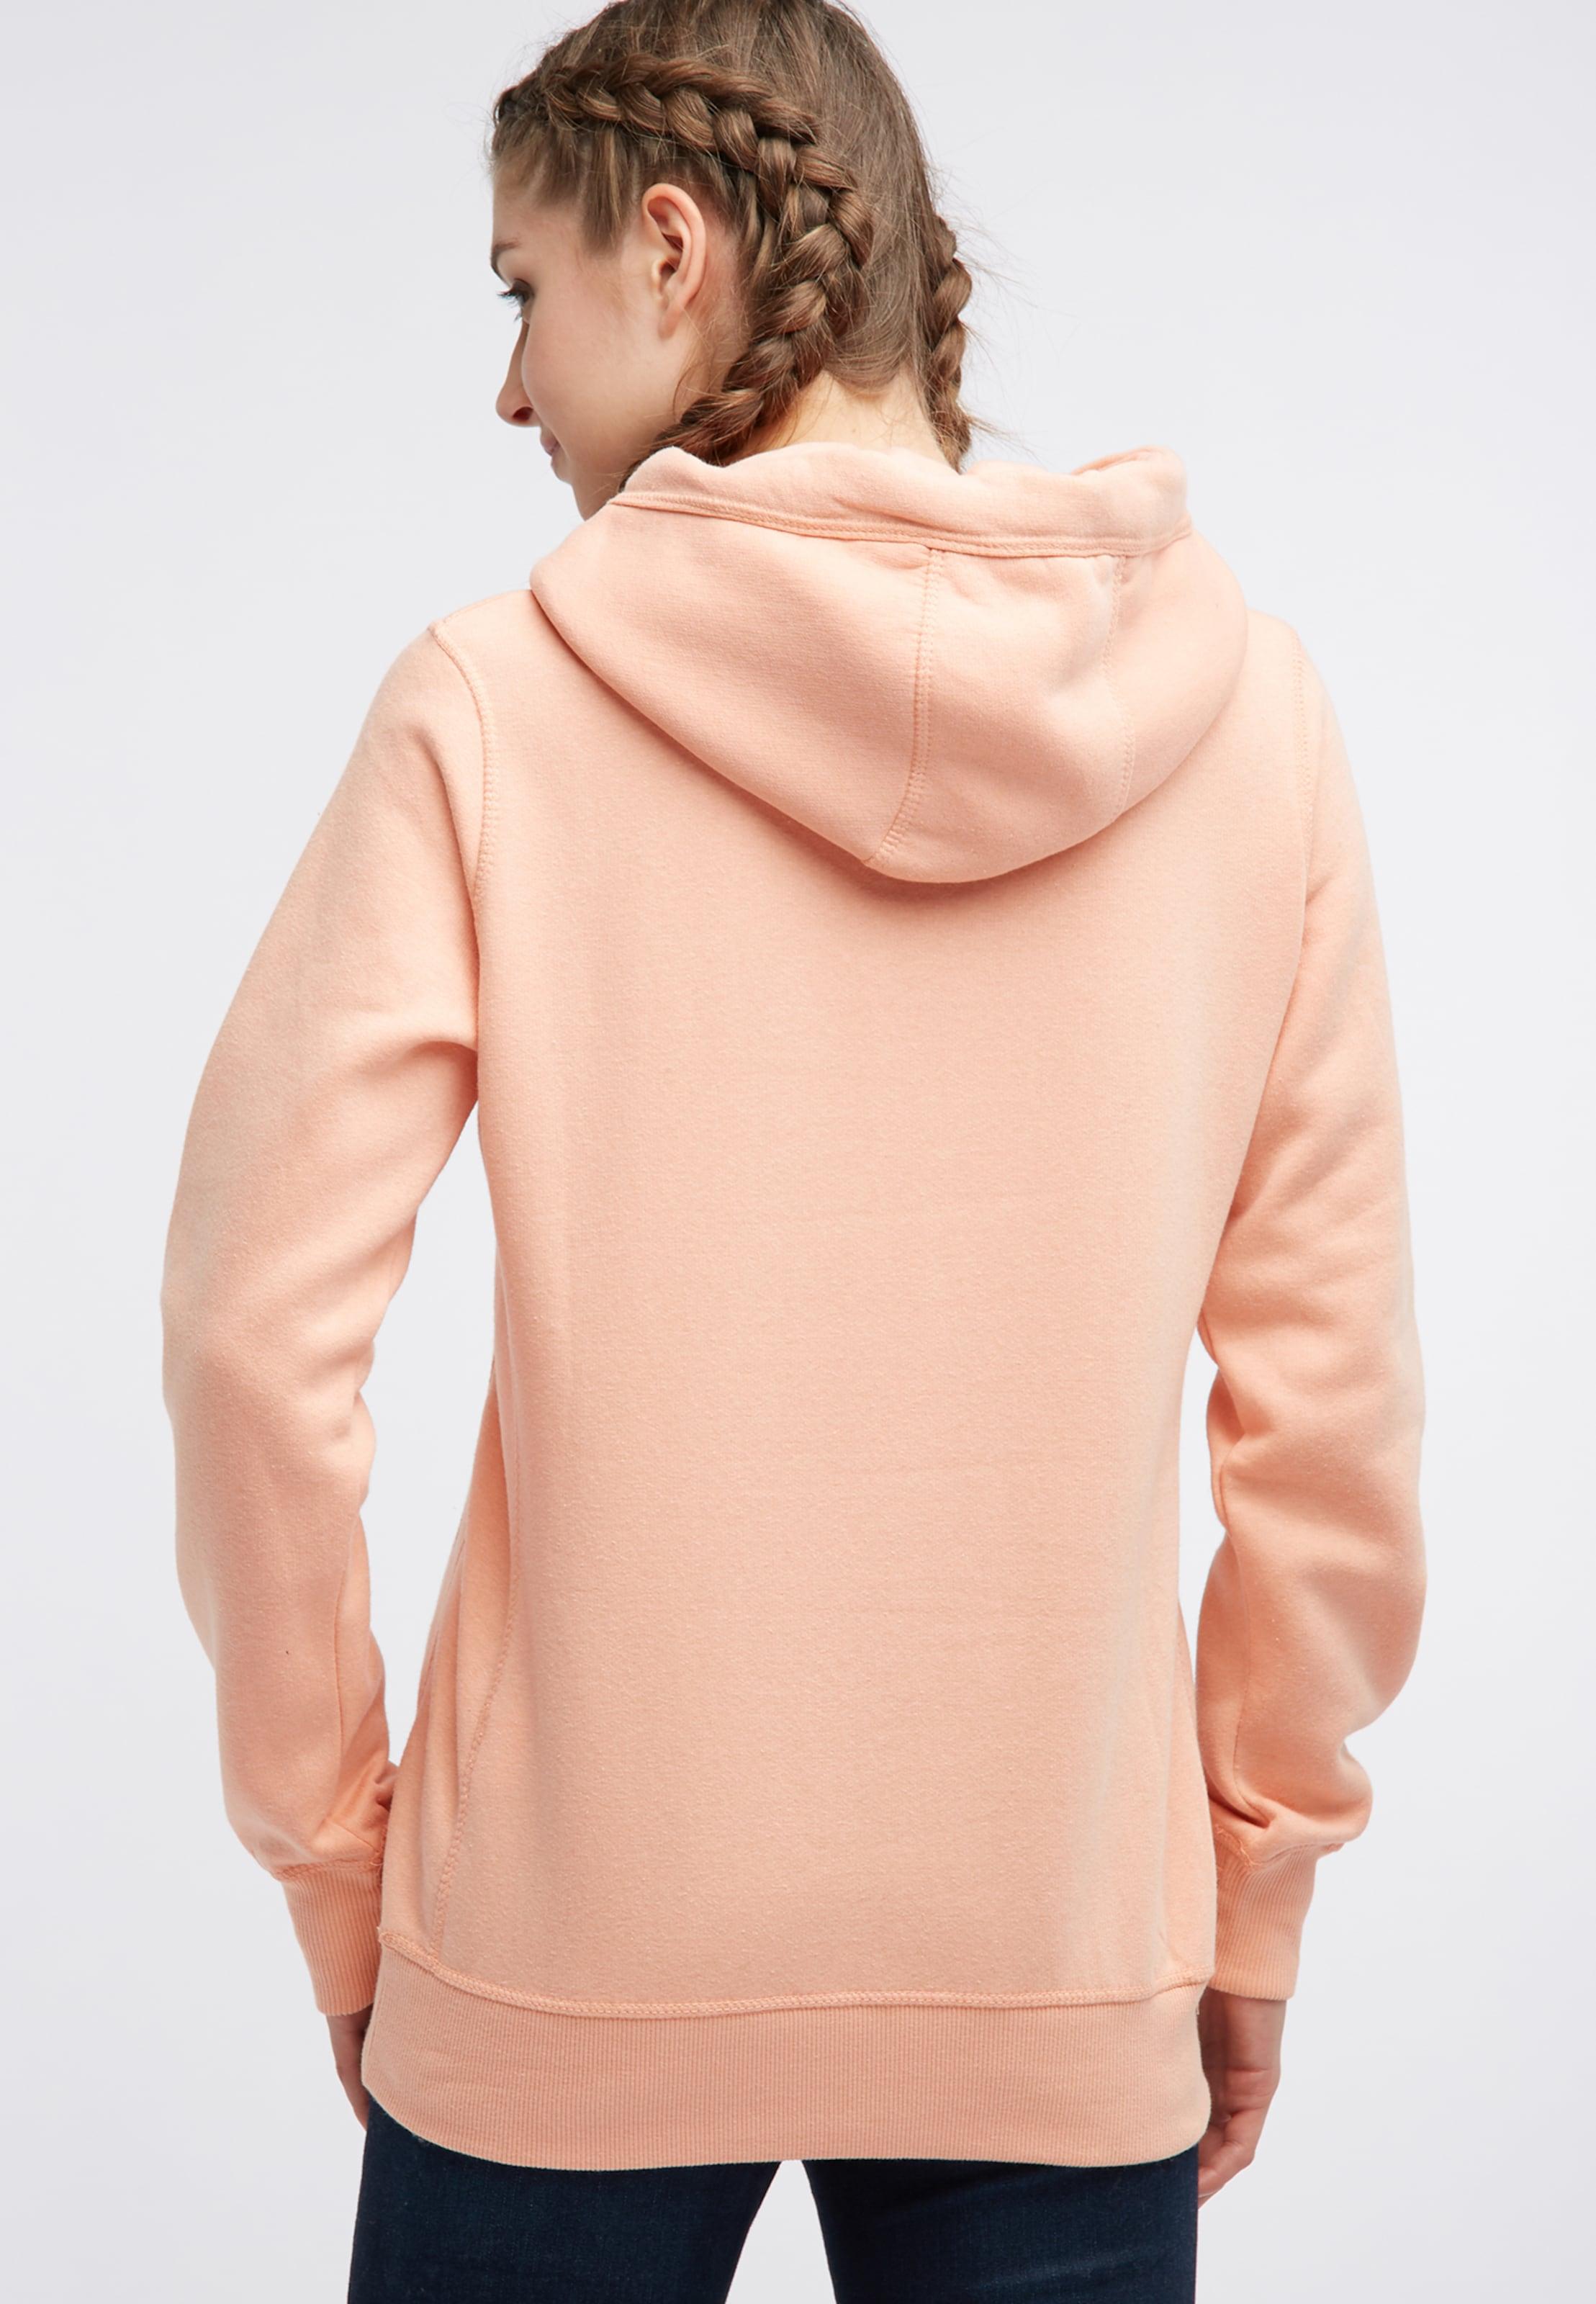 Sweat Mymo Sweat Mymo shirt En En Abricot Abricot Sweat shirt Mymo DeIWYH9E2